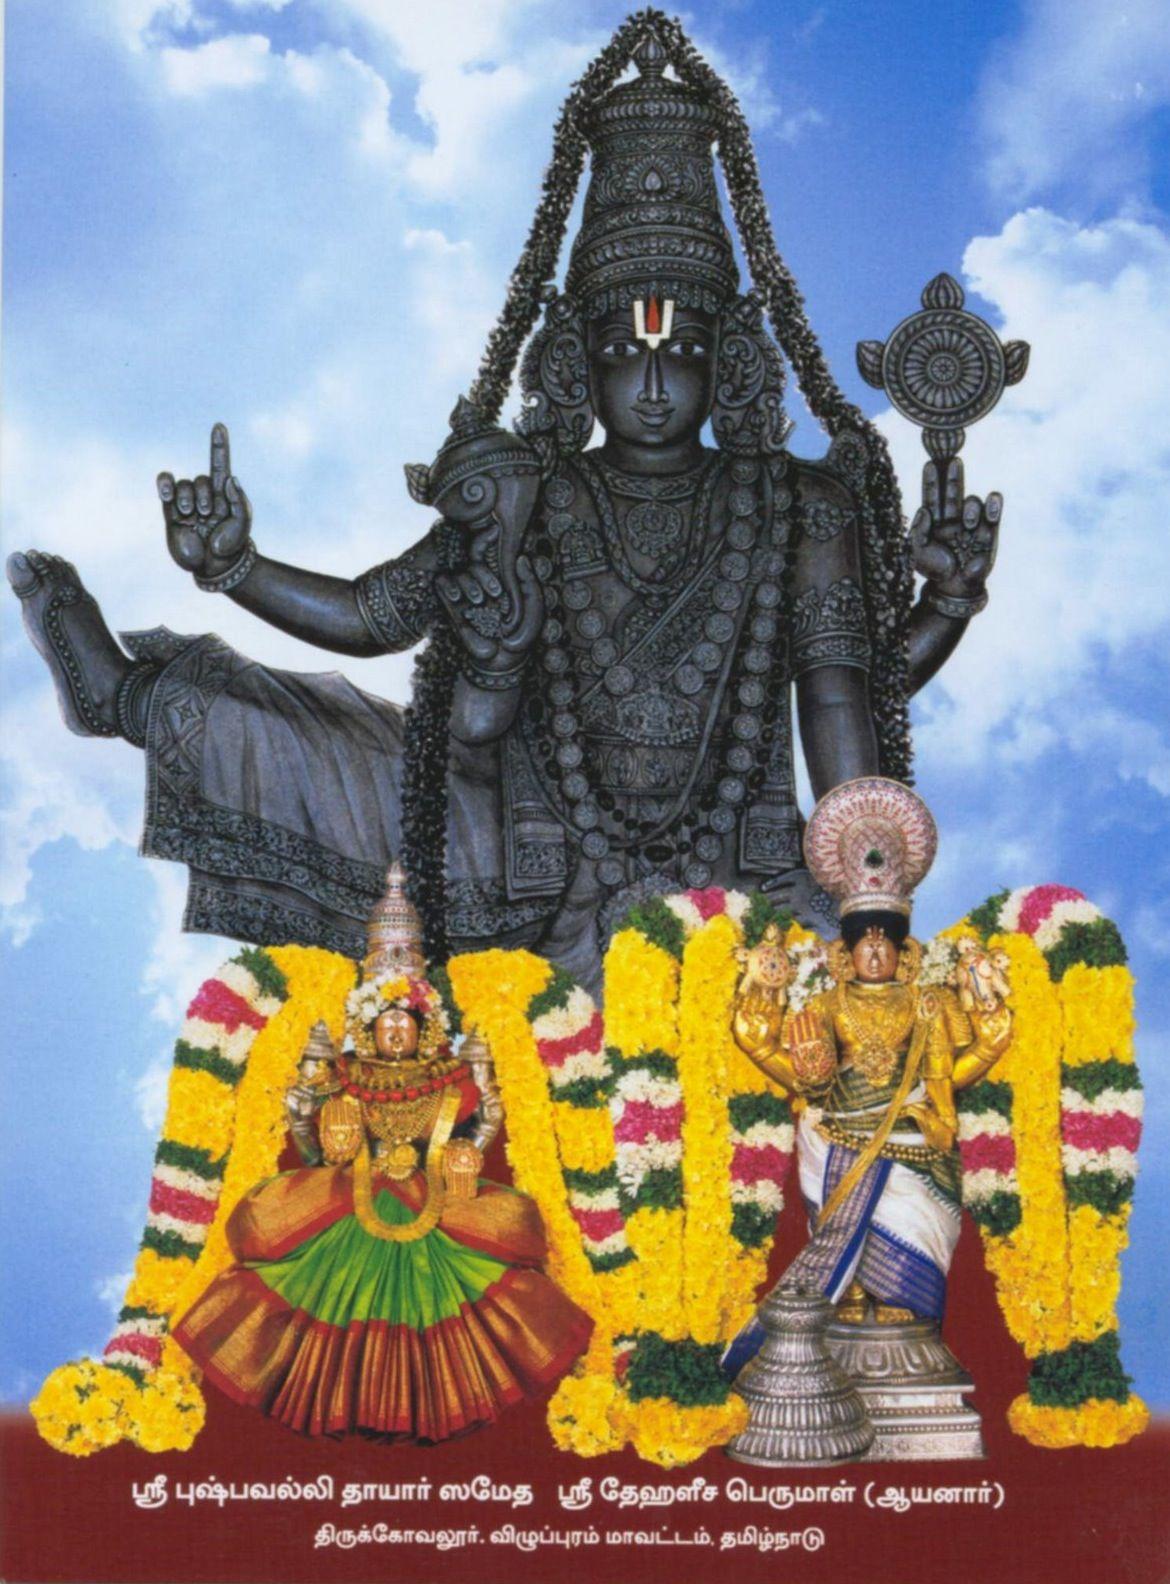 Tirukoilur Trivikrama